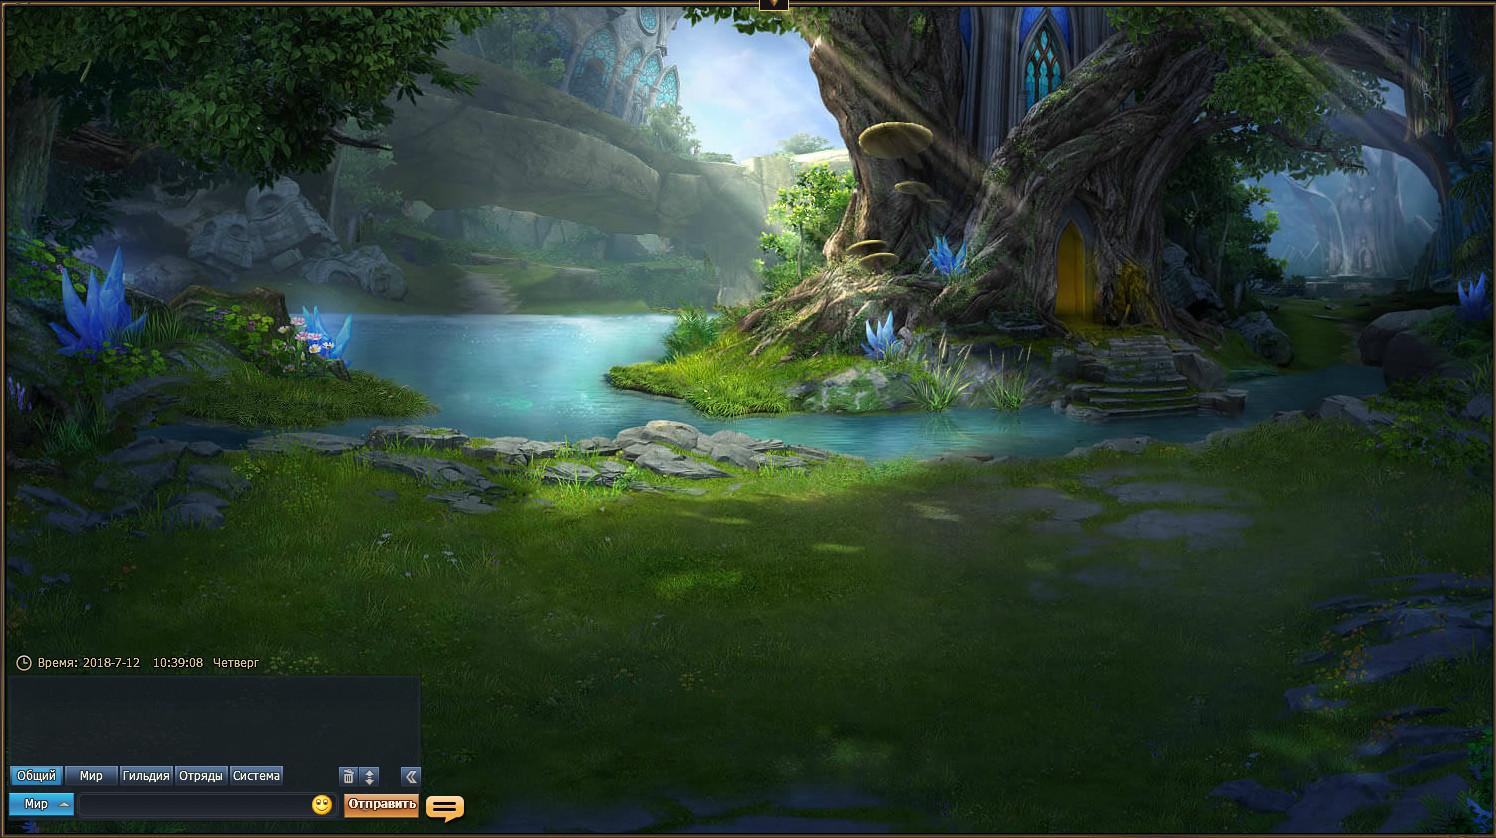 Desktop_180712_1239